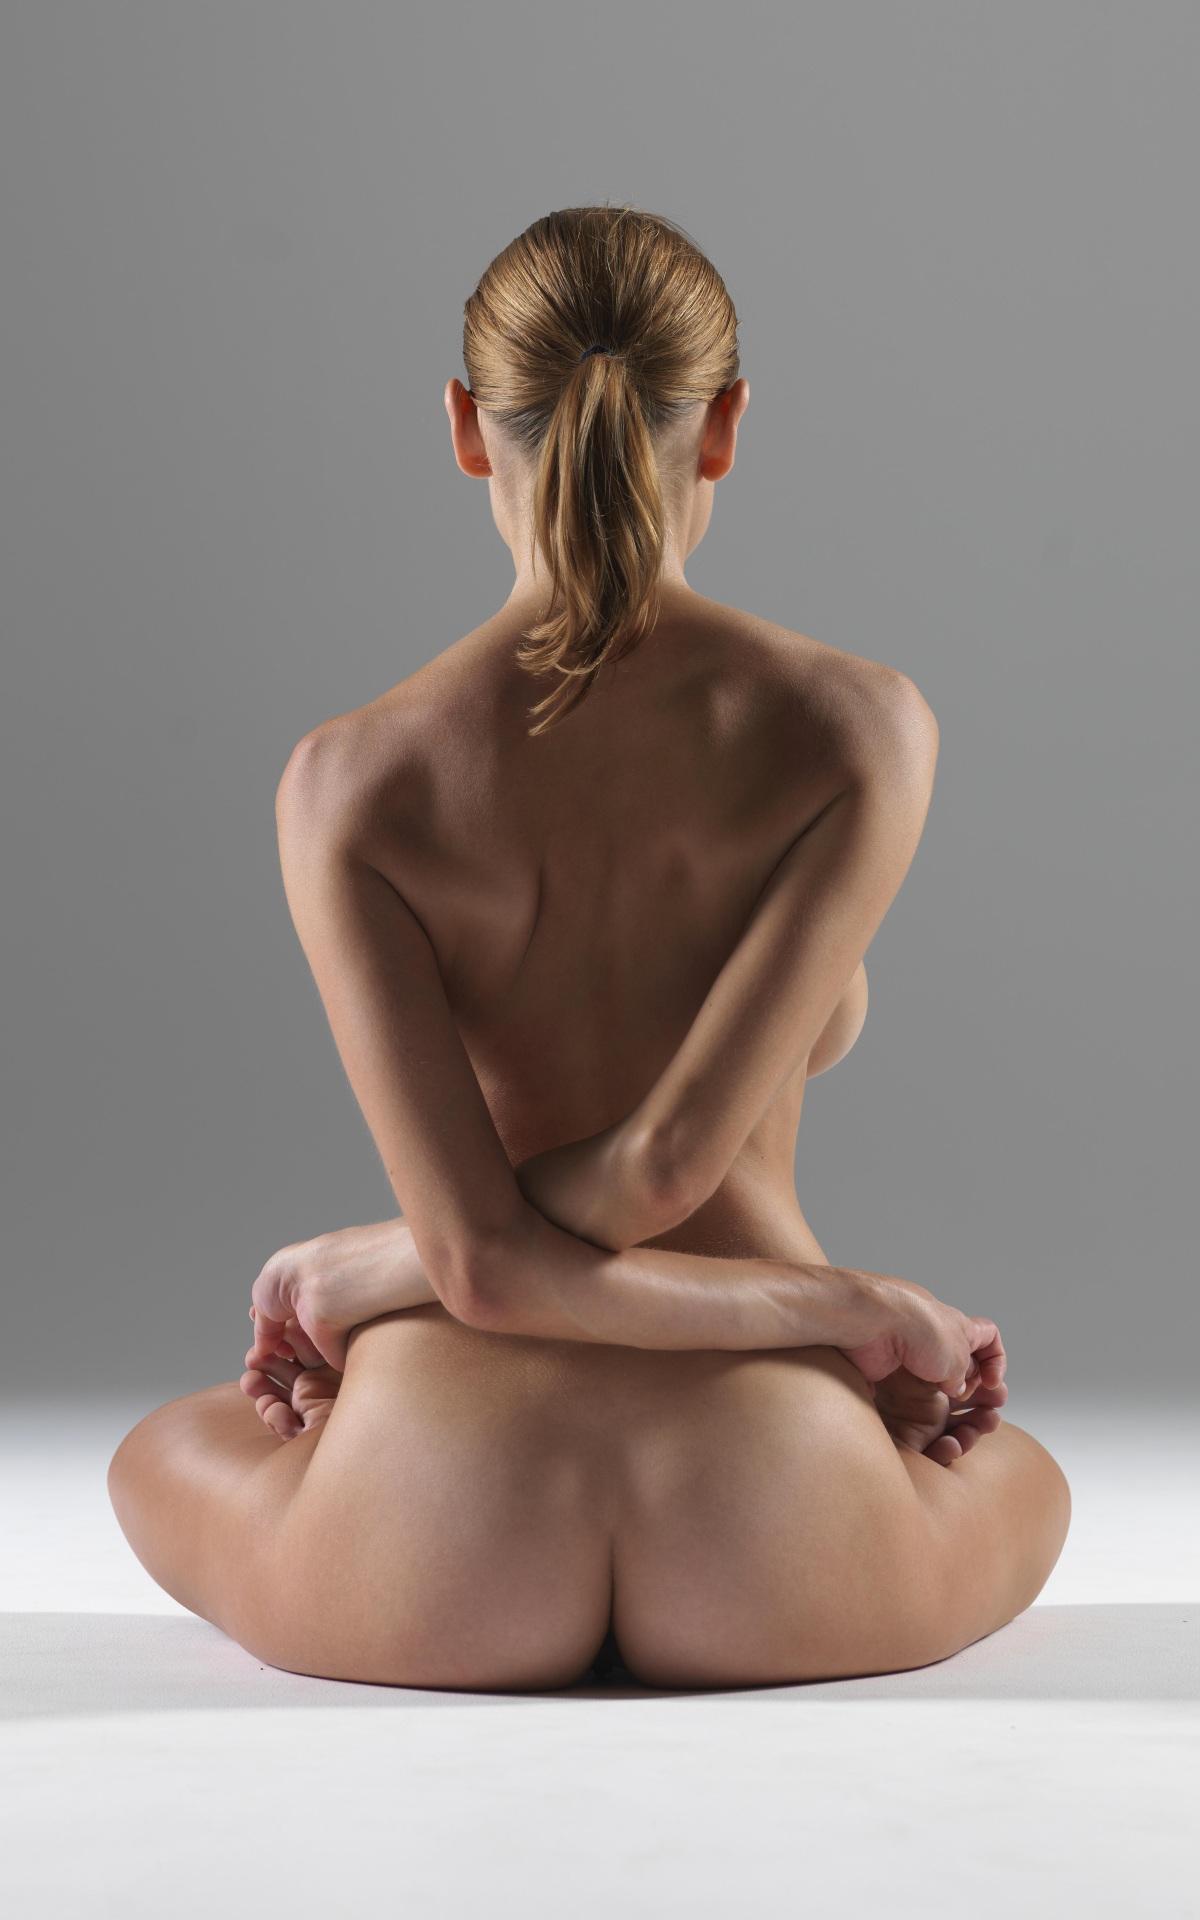 Голая девушка йога фото